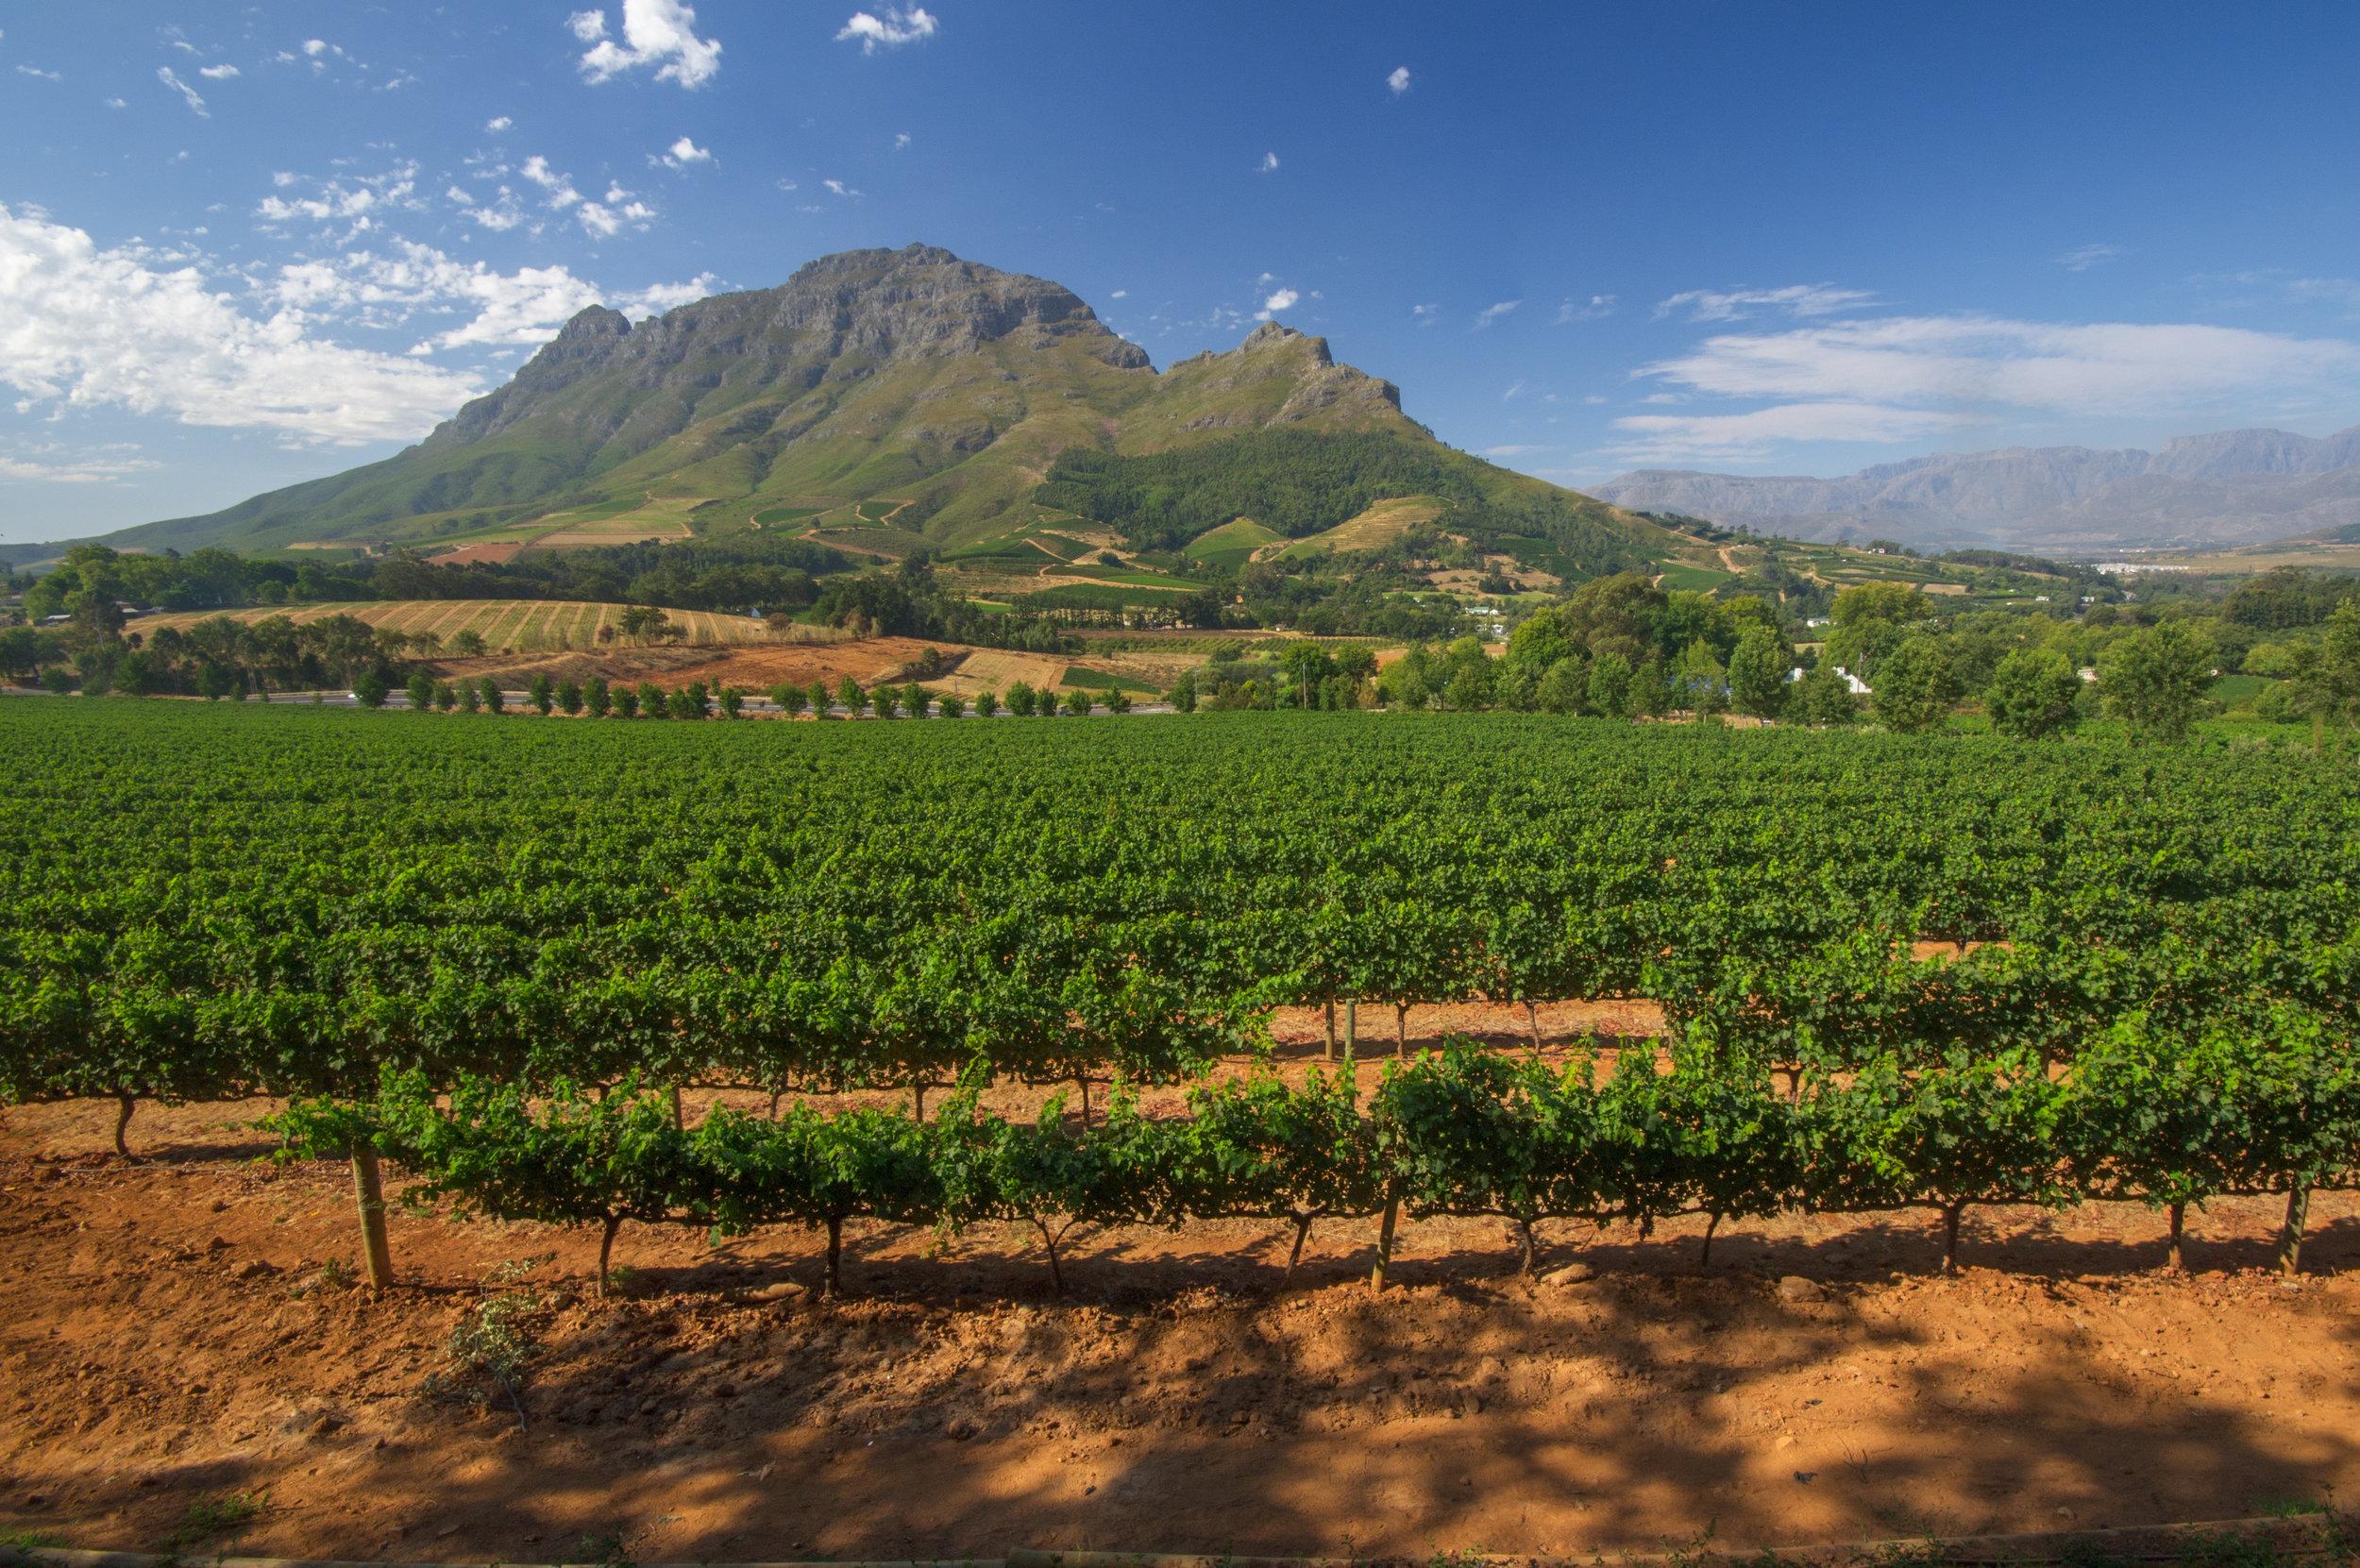 Stellenbosch Vineyard, Western Cape, South Africa